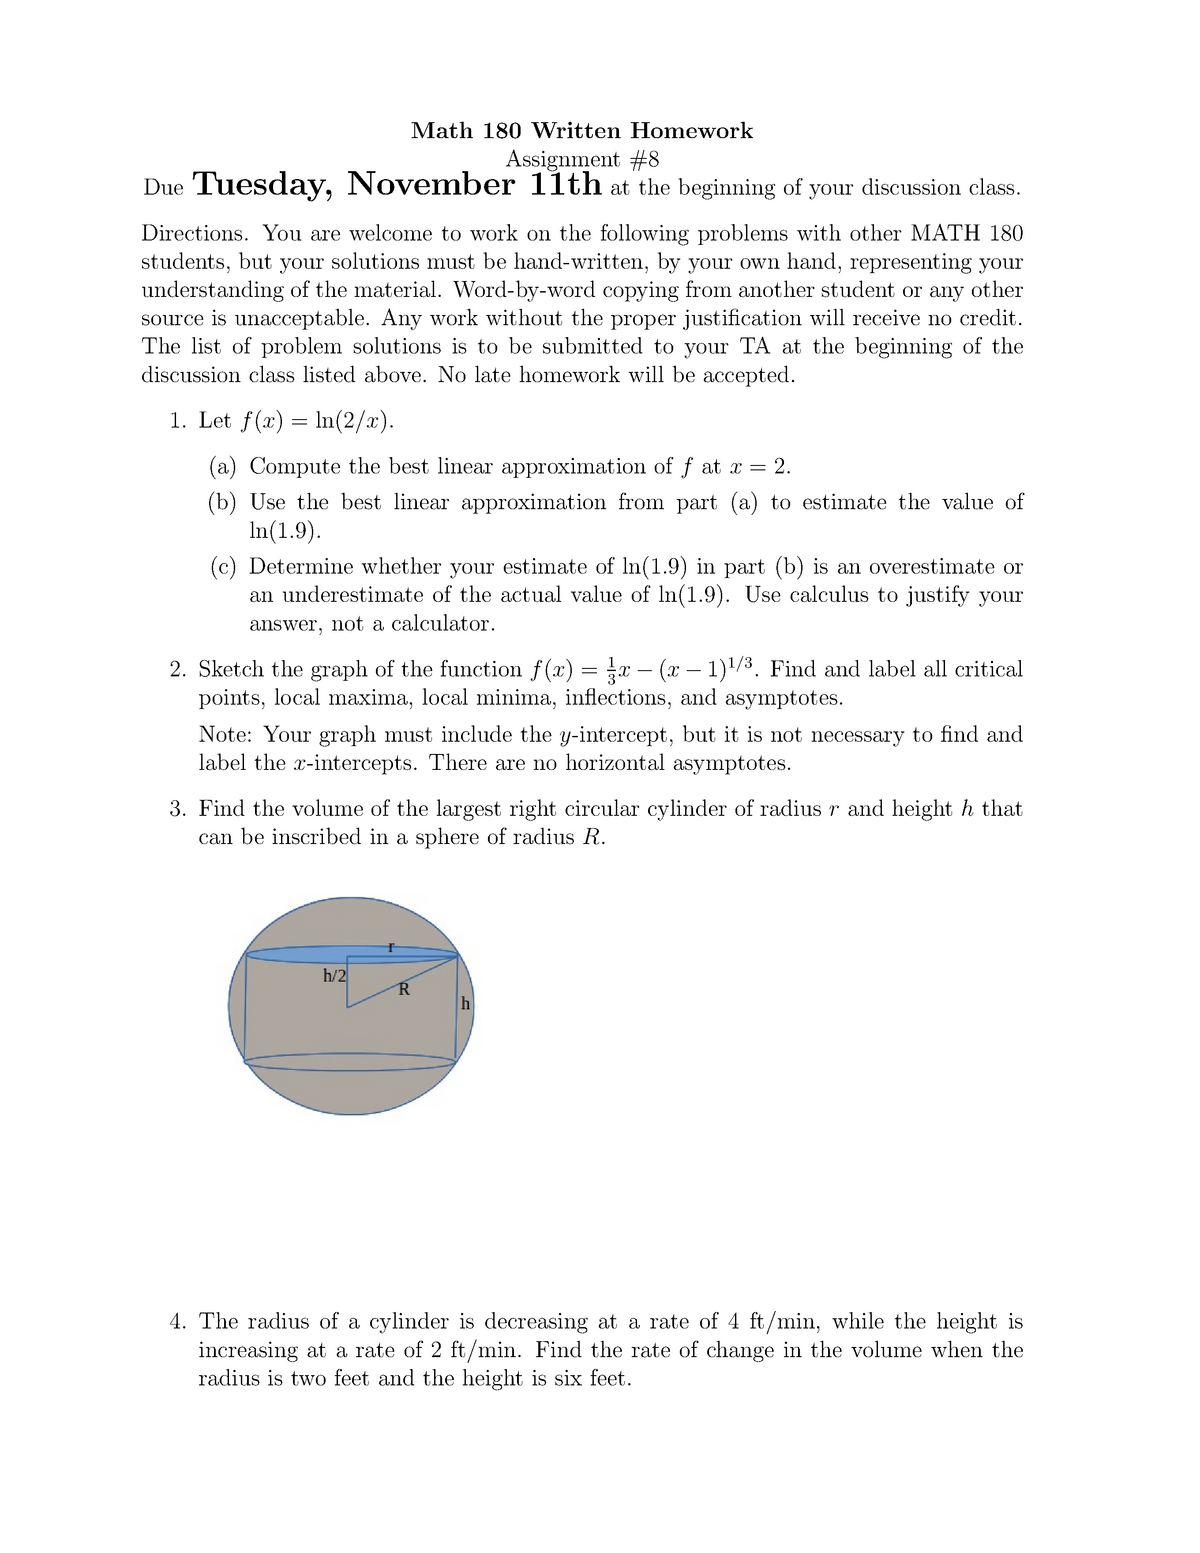 Math 180 Written Homework 8 - MATH 180: Calculus I - StuDocu